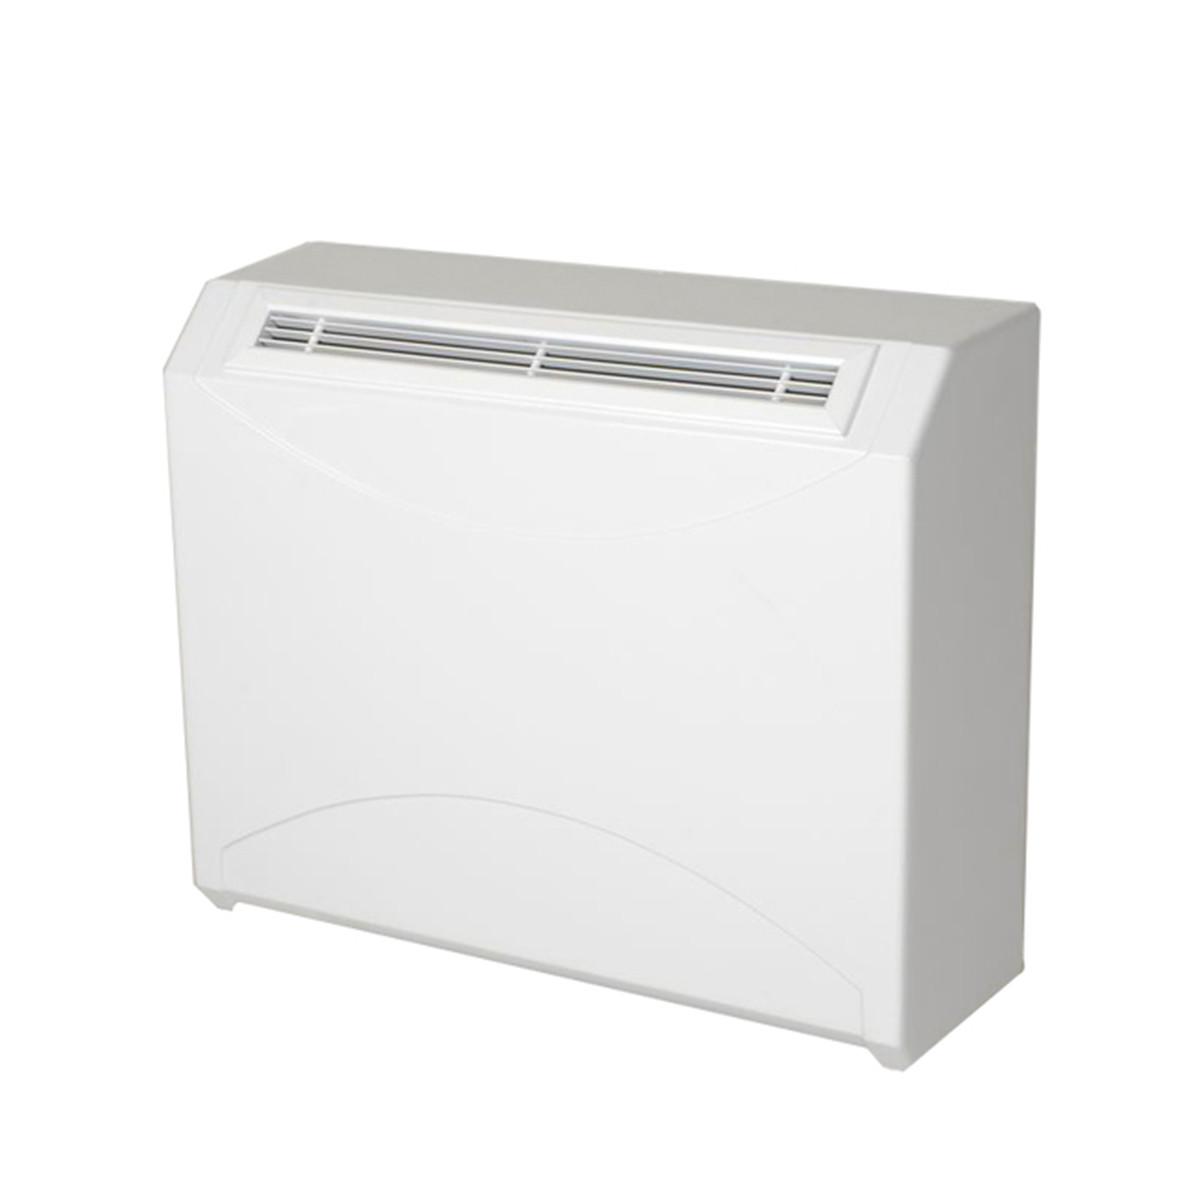 Осушитель воздуха Microwell DRY 400 Plastik